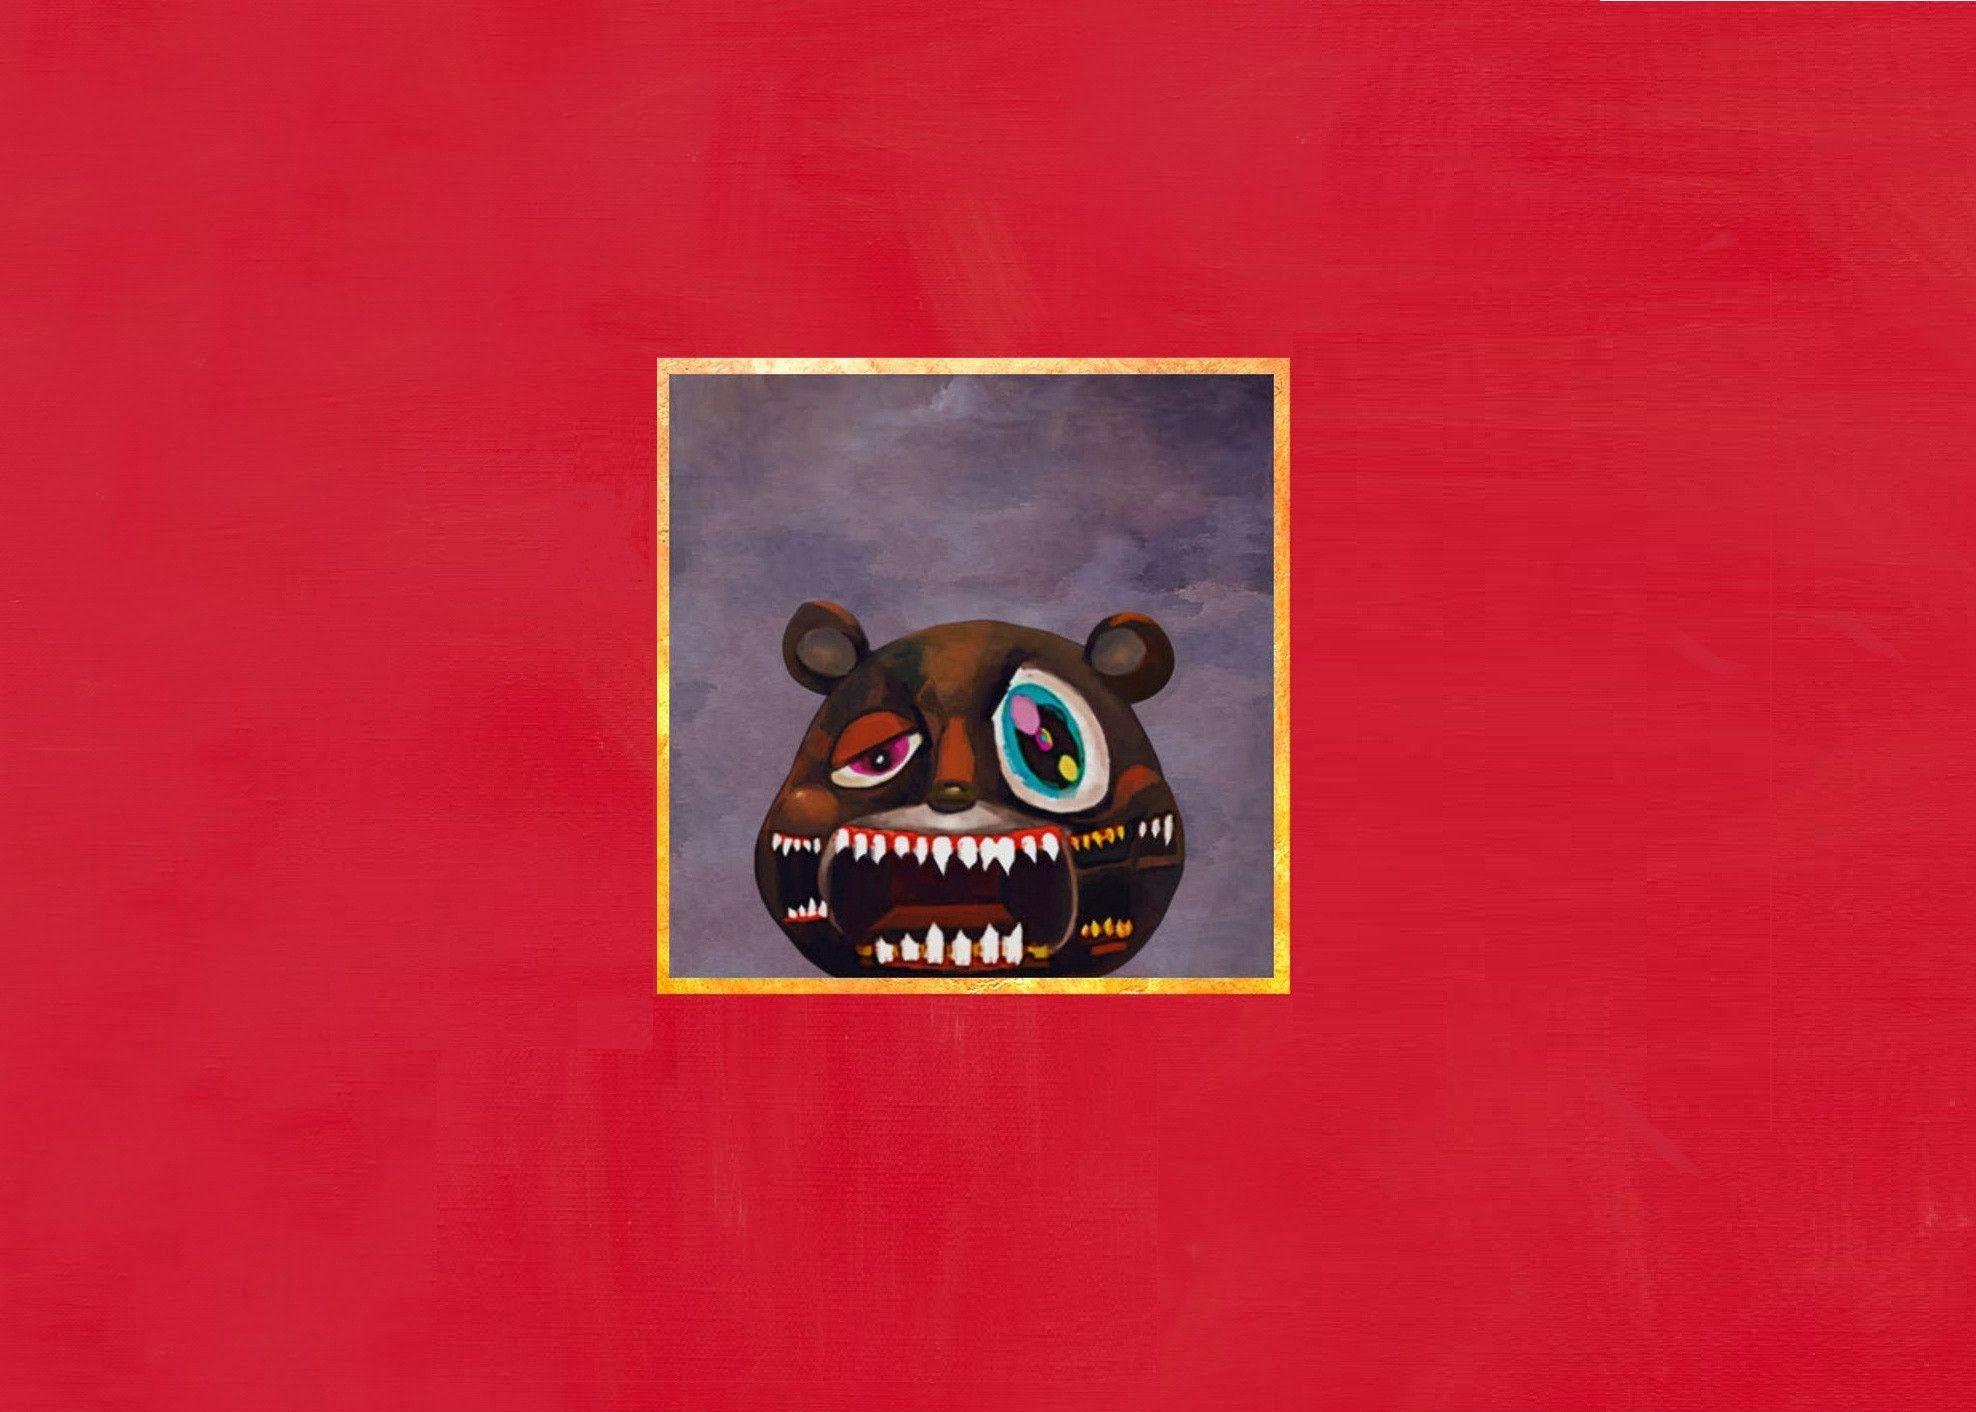 Kanye West Beautiful Dark Twisted Fantasy Beautiful Dark Twisted Fantasy Kanye West Songs Poster Prints